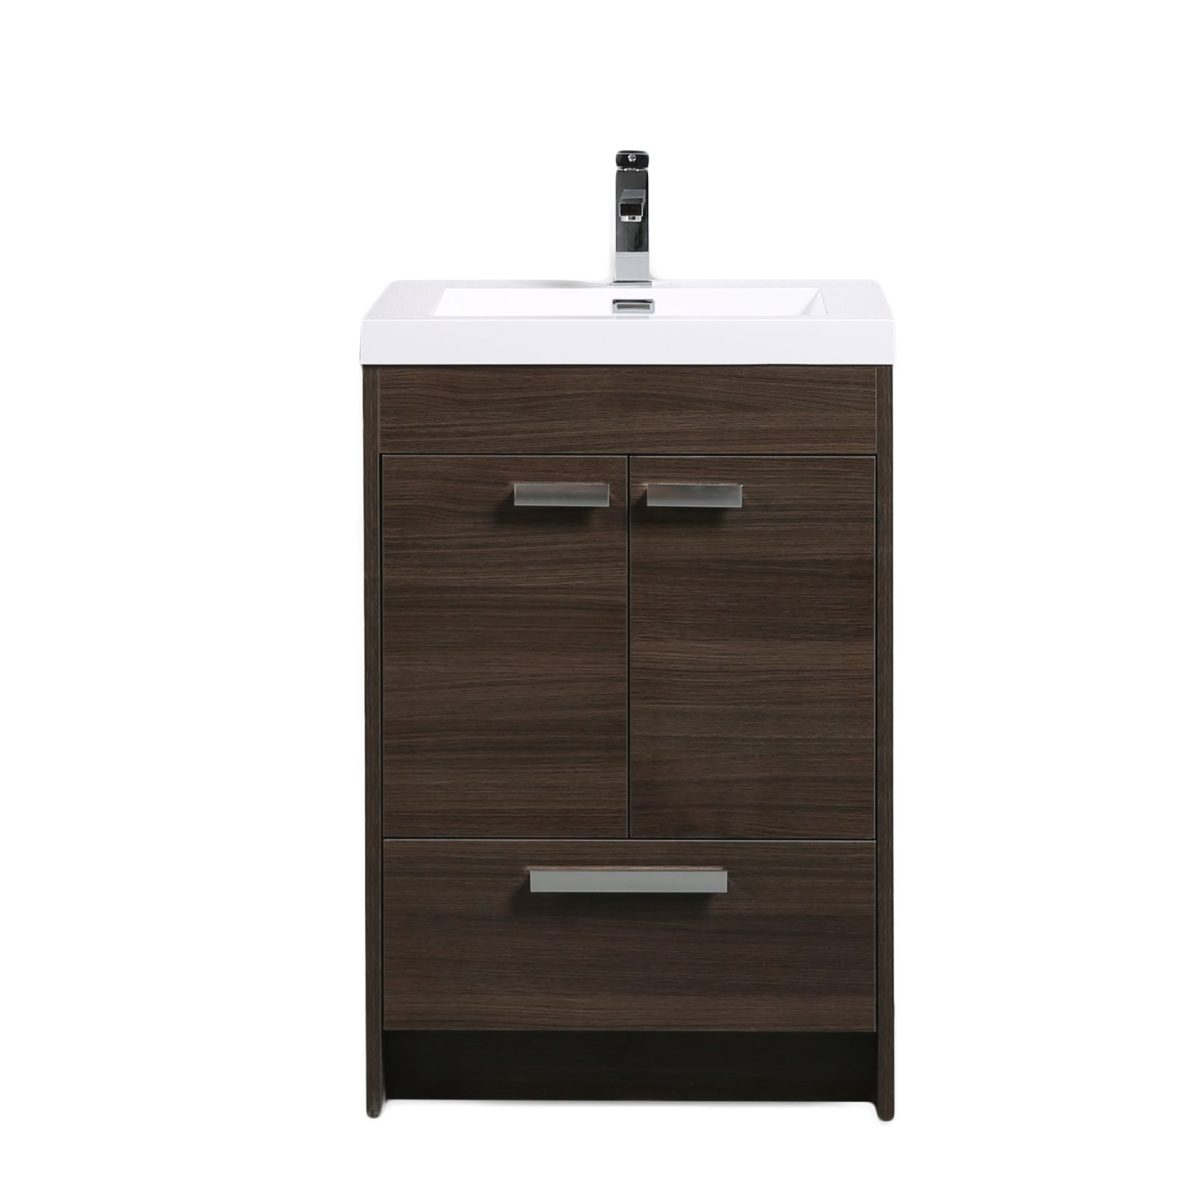 Eviva Lugano 24 In. Grey Oak Modern Bathroom Vanity With White Integrated Acrylic Sink